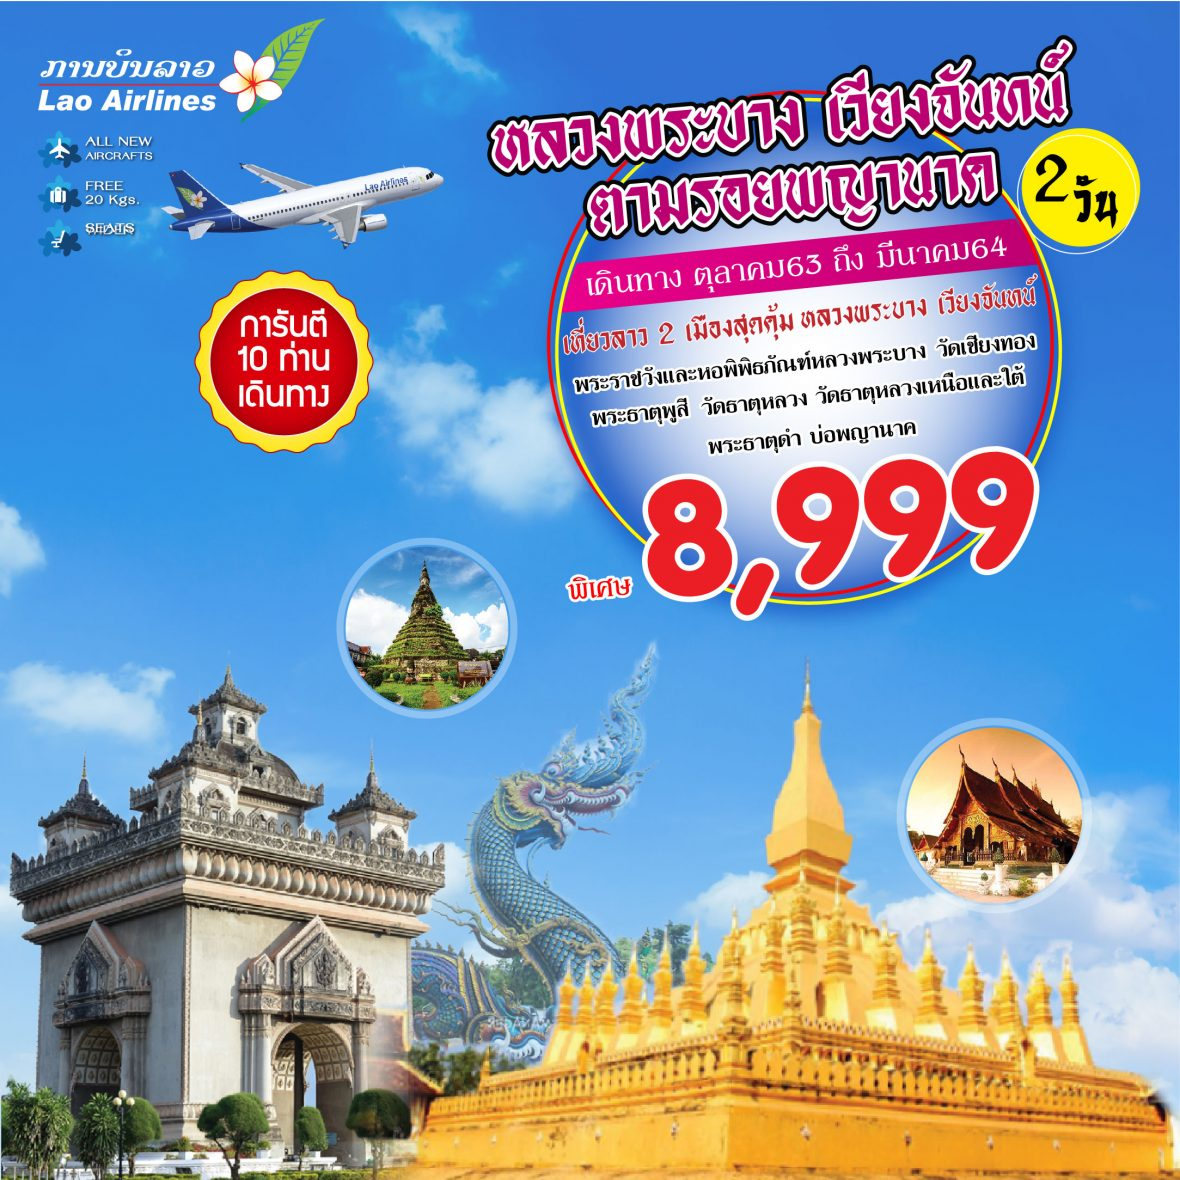 Luang Prabang Vientiane Prayanak_2D_Oct20-Mar21_1040-01